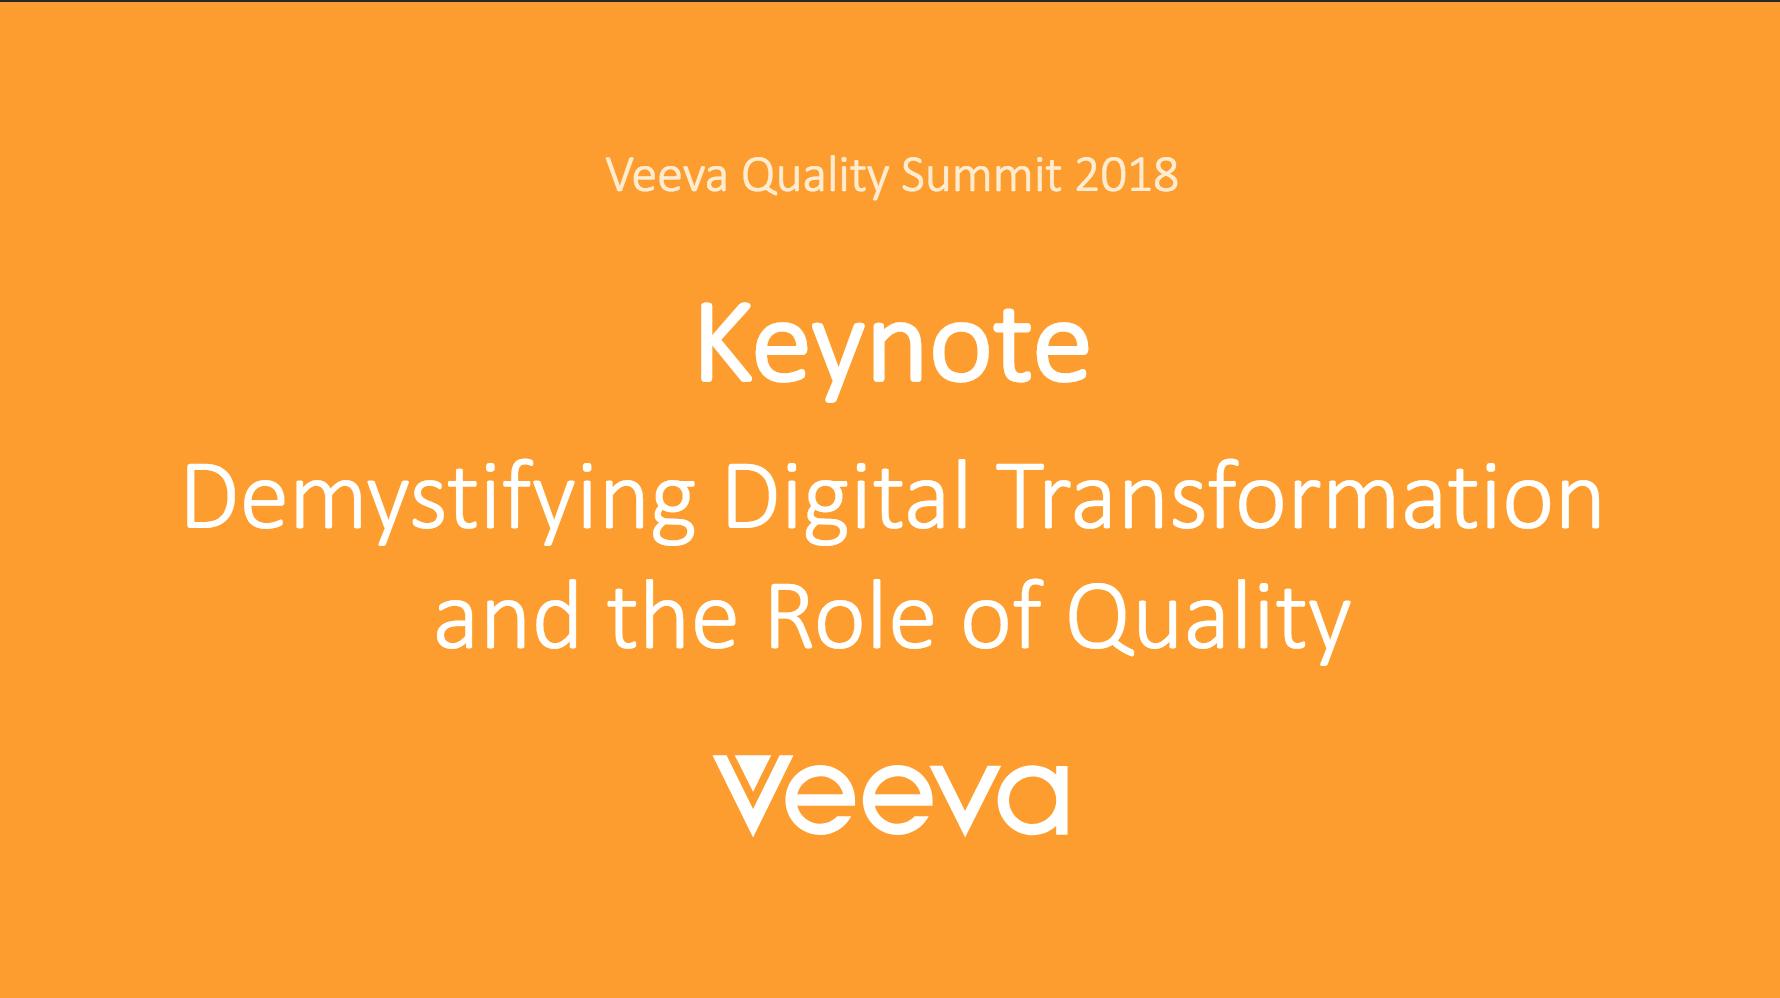 QualityOne Veeva Keynote Presentation